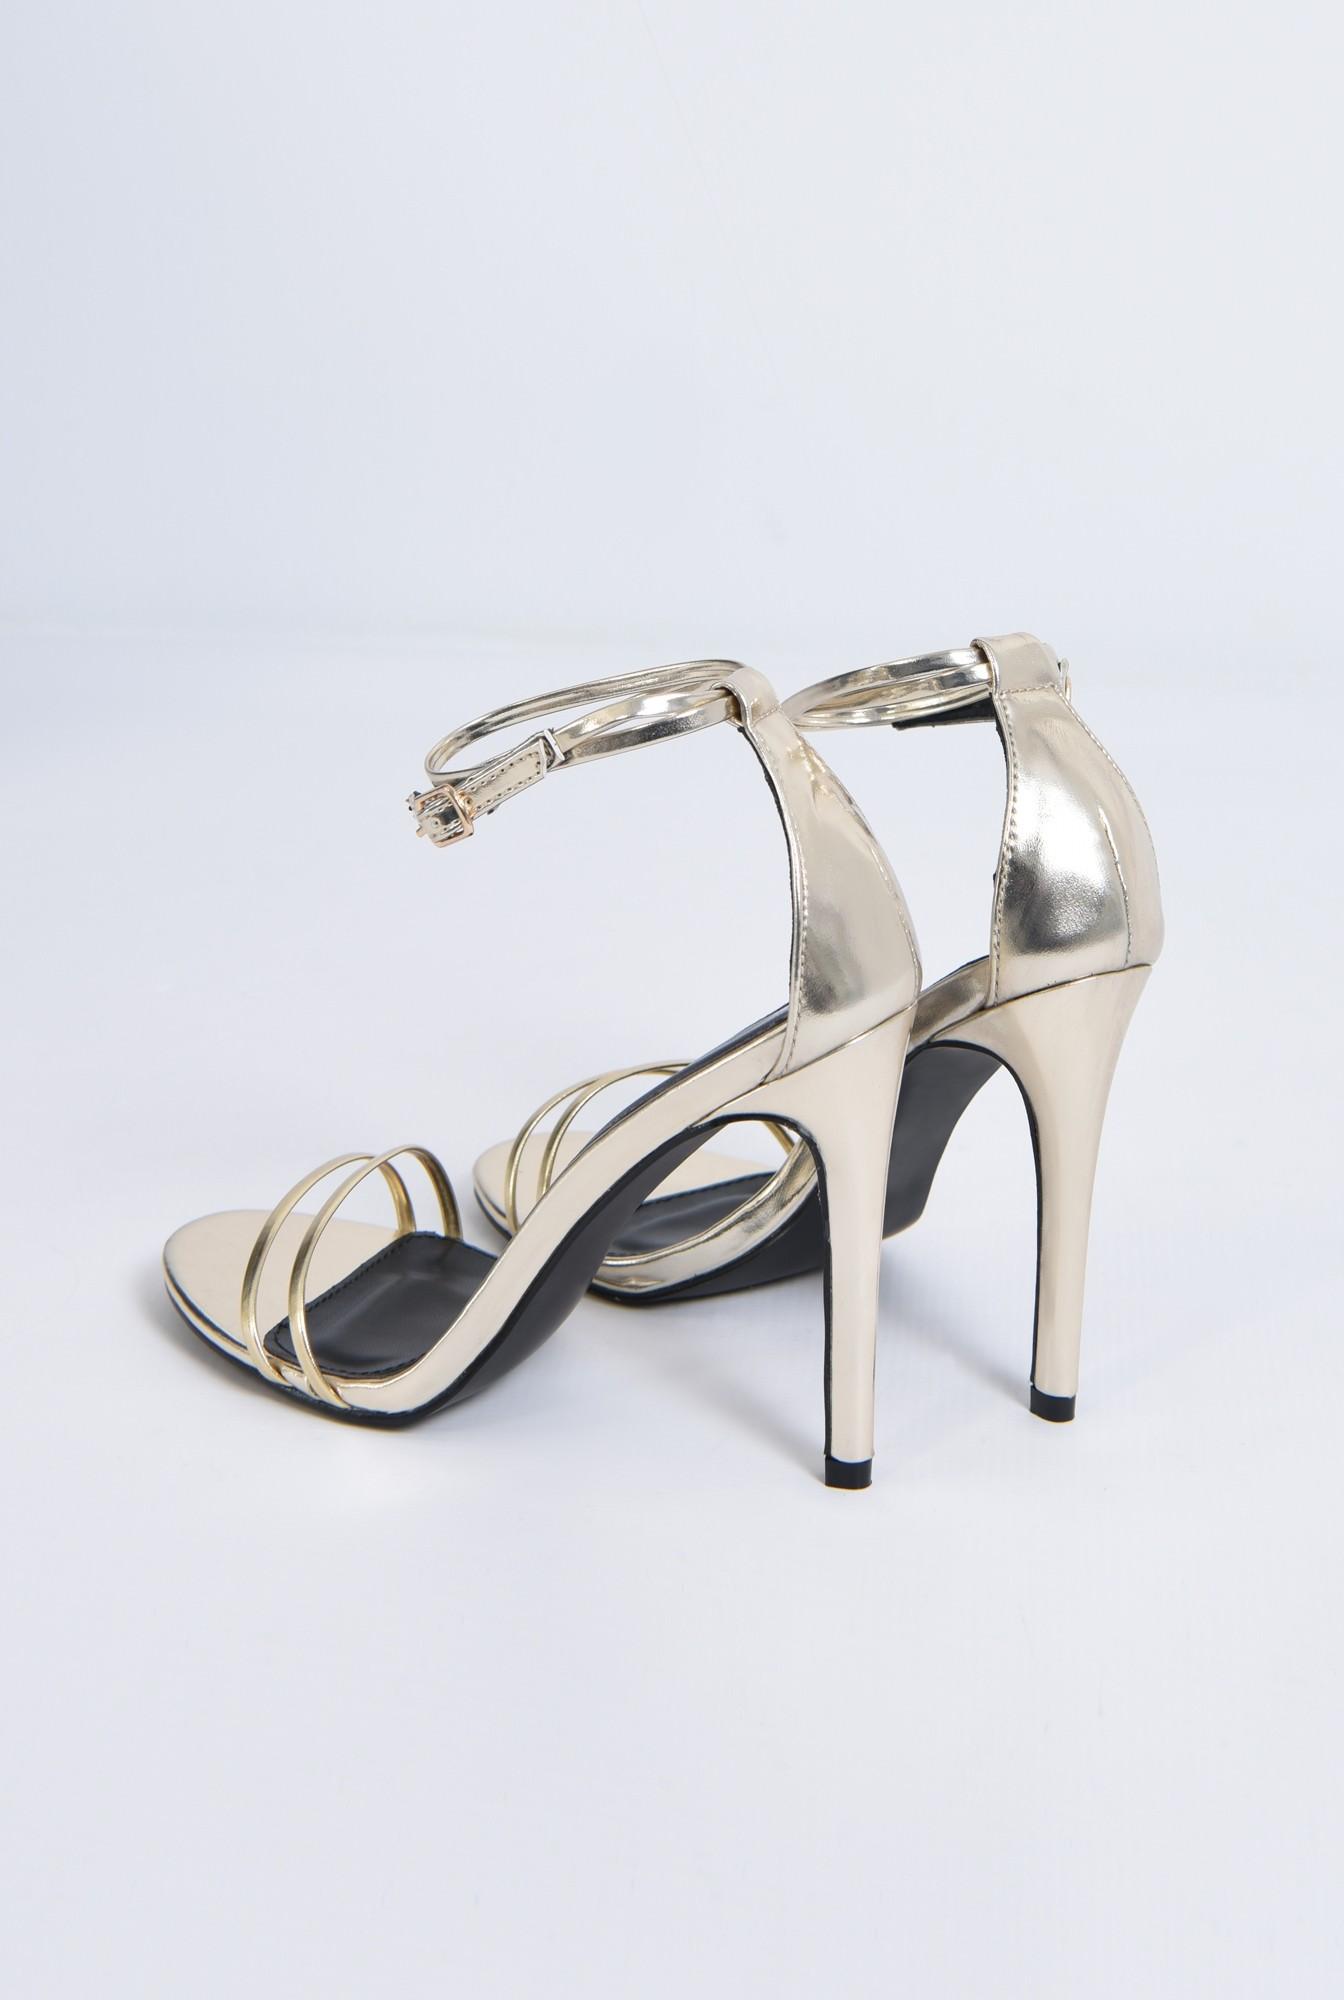 4 - sandale elegante, aurii, stiletto